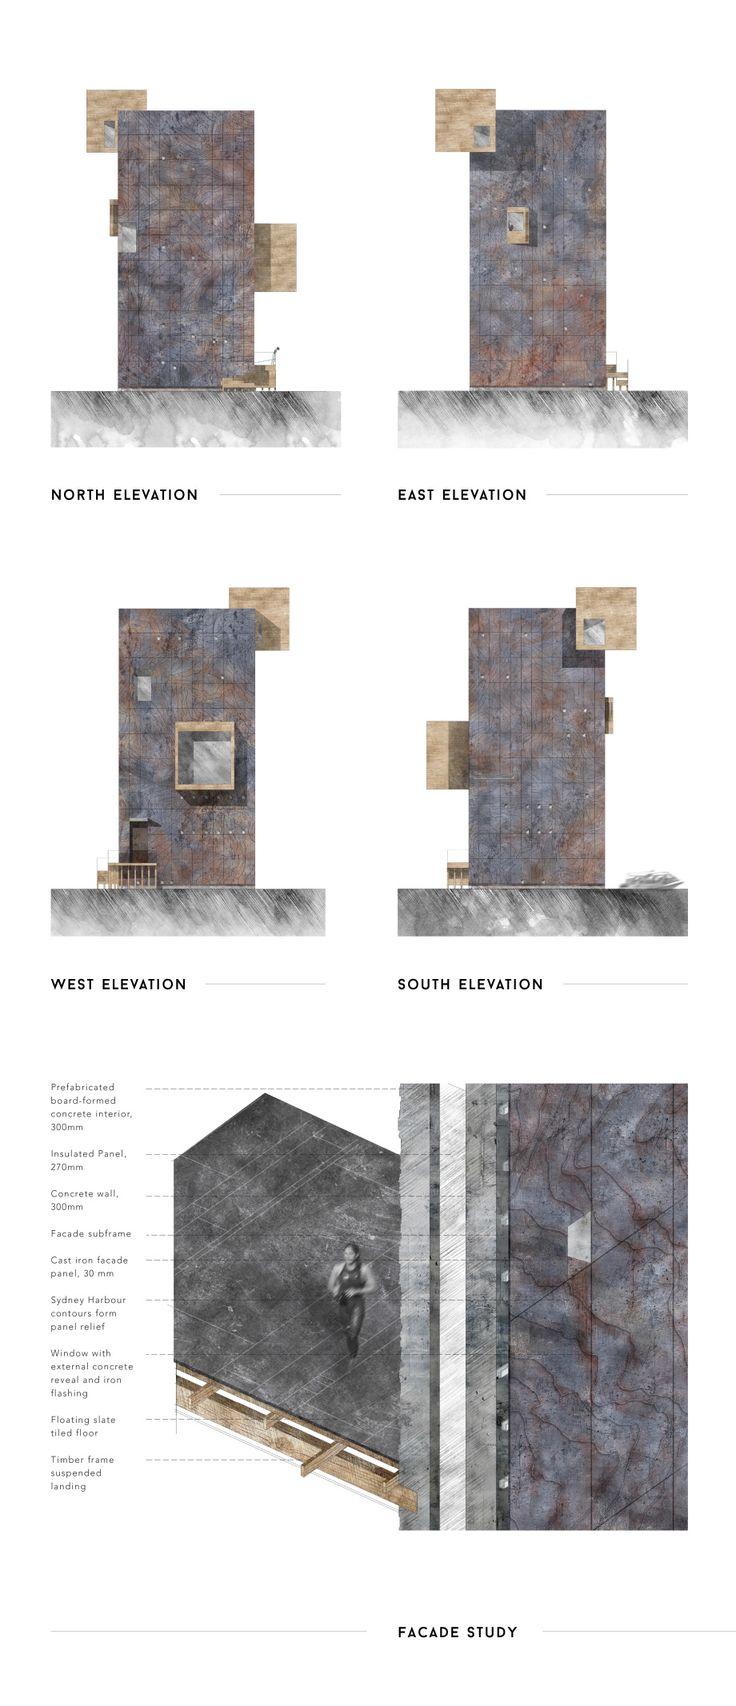 Sydney Harbour - elevations + facade study